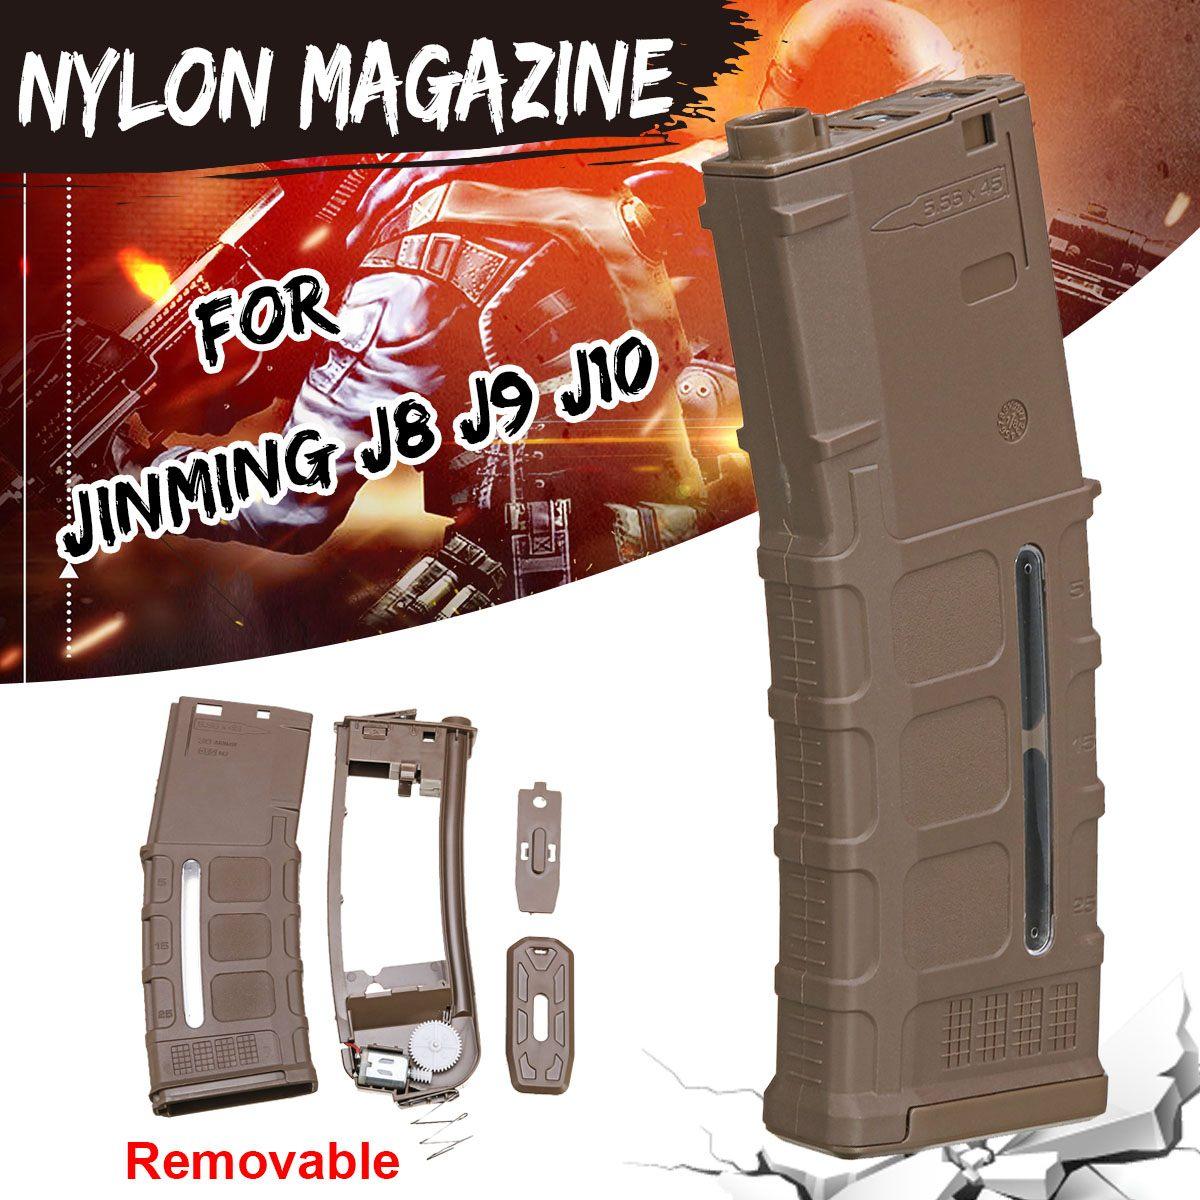 Nylon Gel Magazine For Jinming J8 J9 J10 Gel Ball Blasters Water Games Toy Guns Replacement Accessories